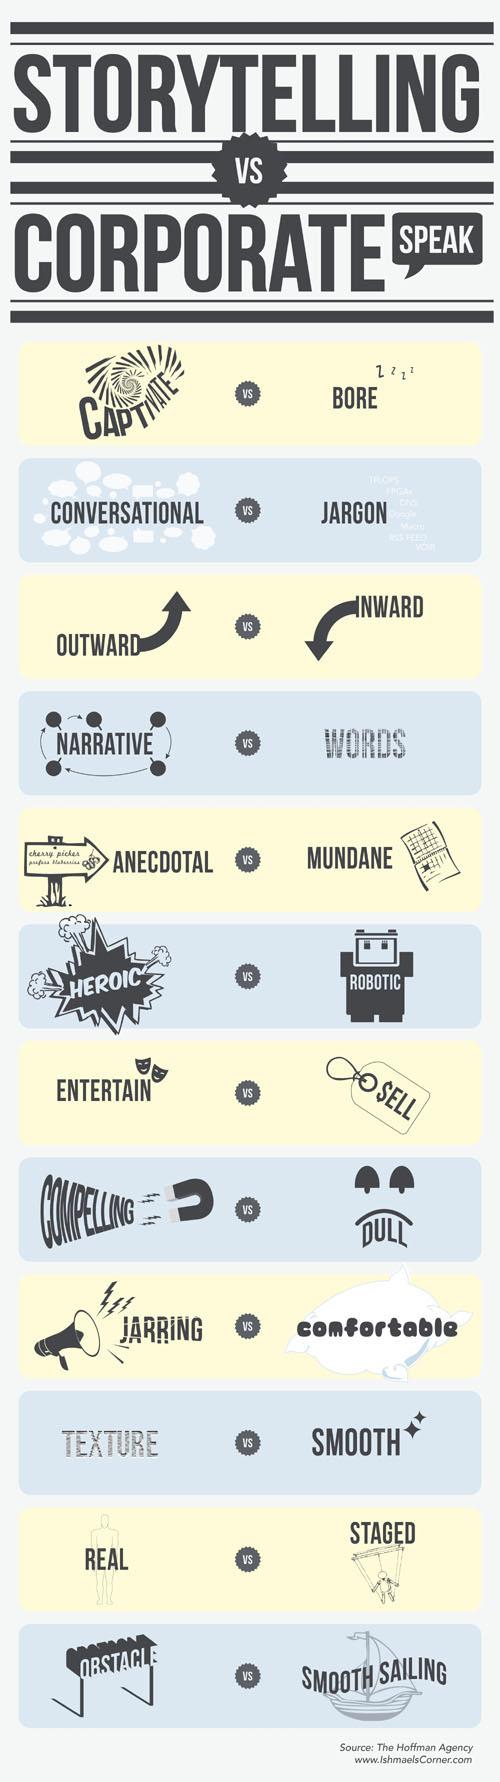 Storytelling For Business - 12 Tips For Better Business Writing